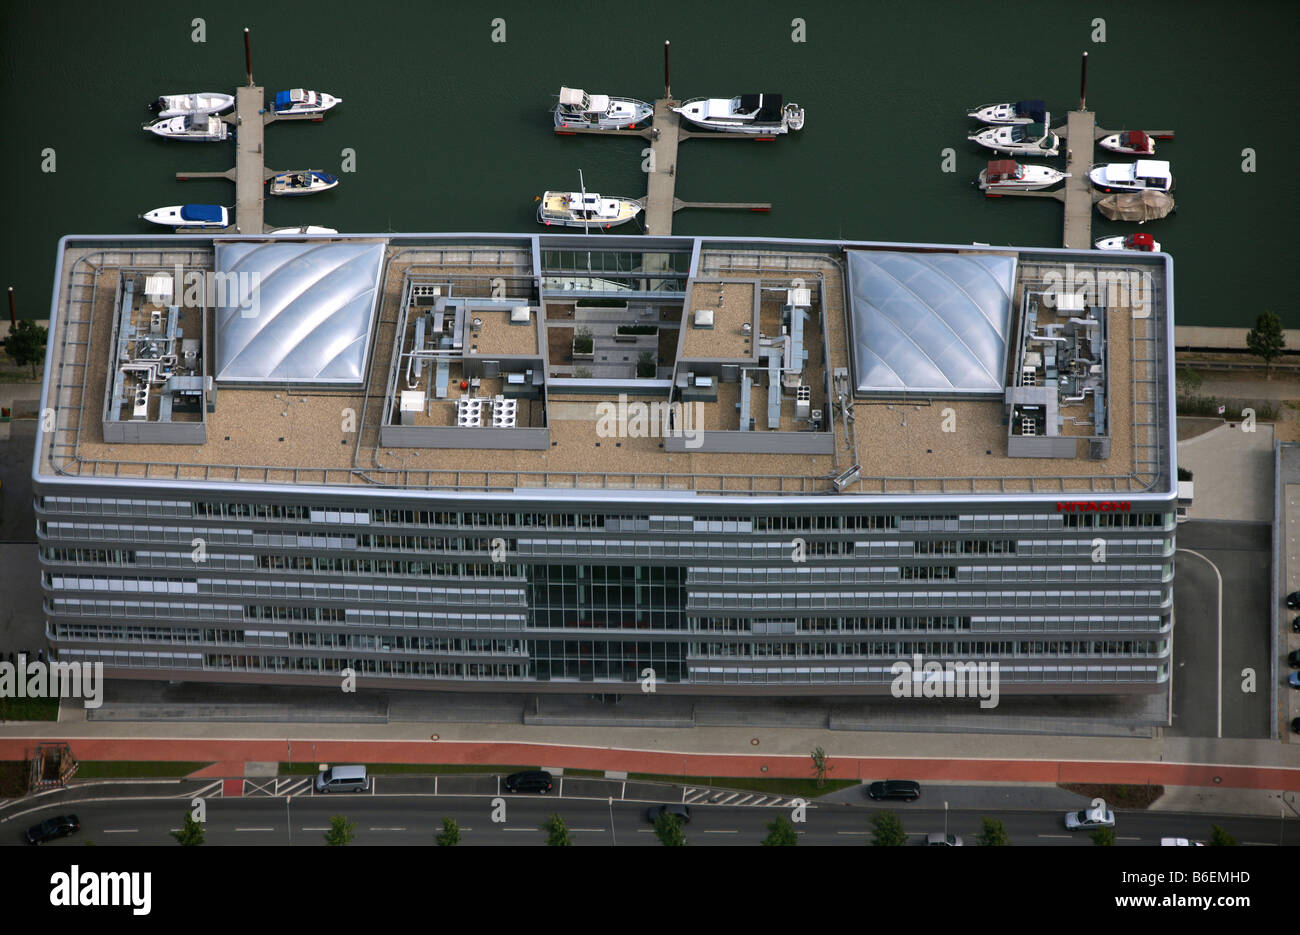 Aerial photograph, inbound harbour, Alltours, wood harbour, Hitachi, Duisburg, North Rhine-Westphalia, Germany, - Stock Image